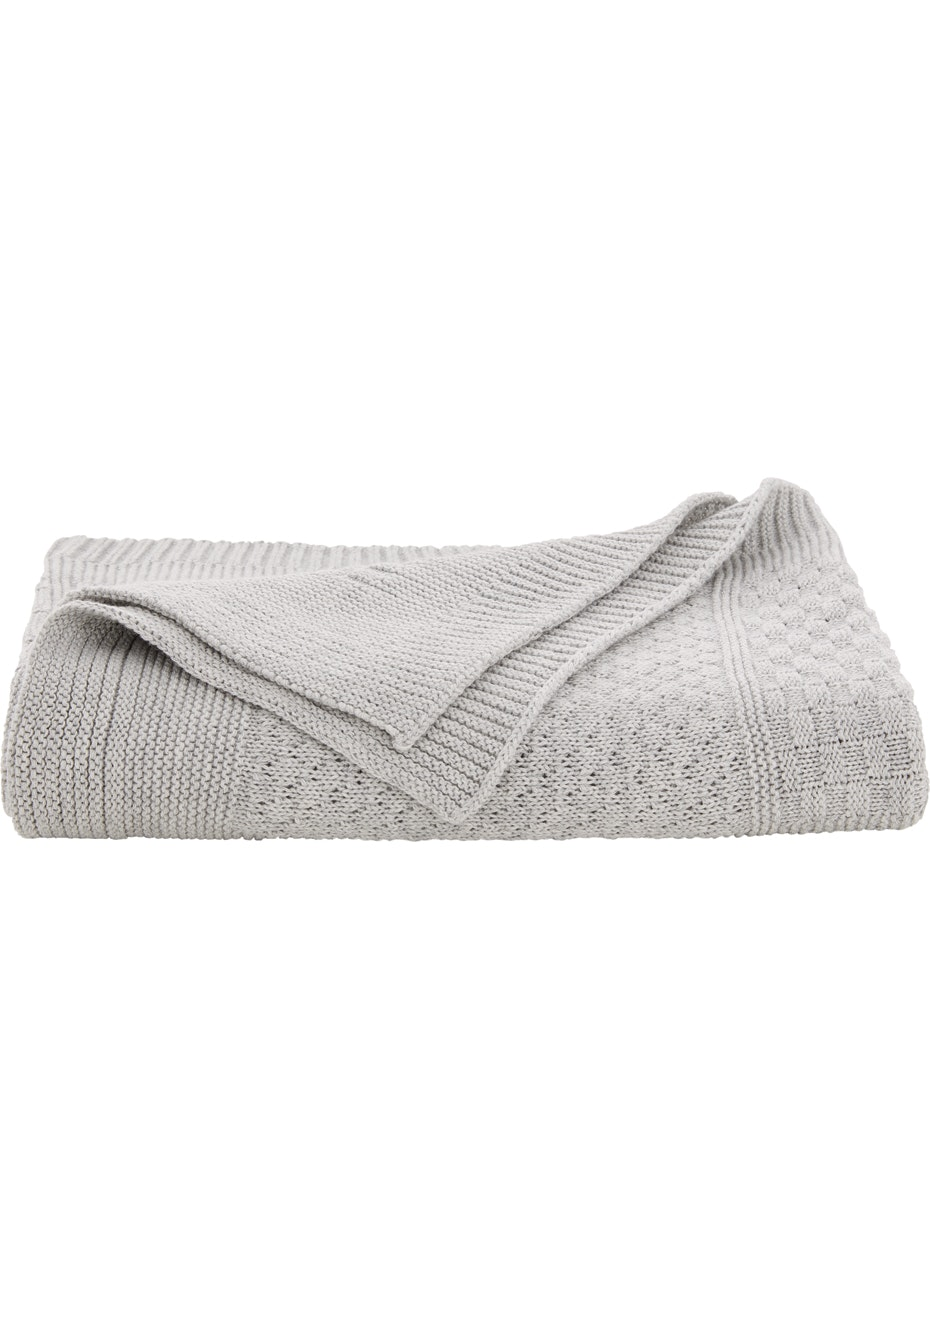 Sheridan - Pembrooke - Cot Blanket - 85cm x 115cm - Marle